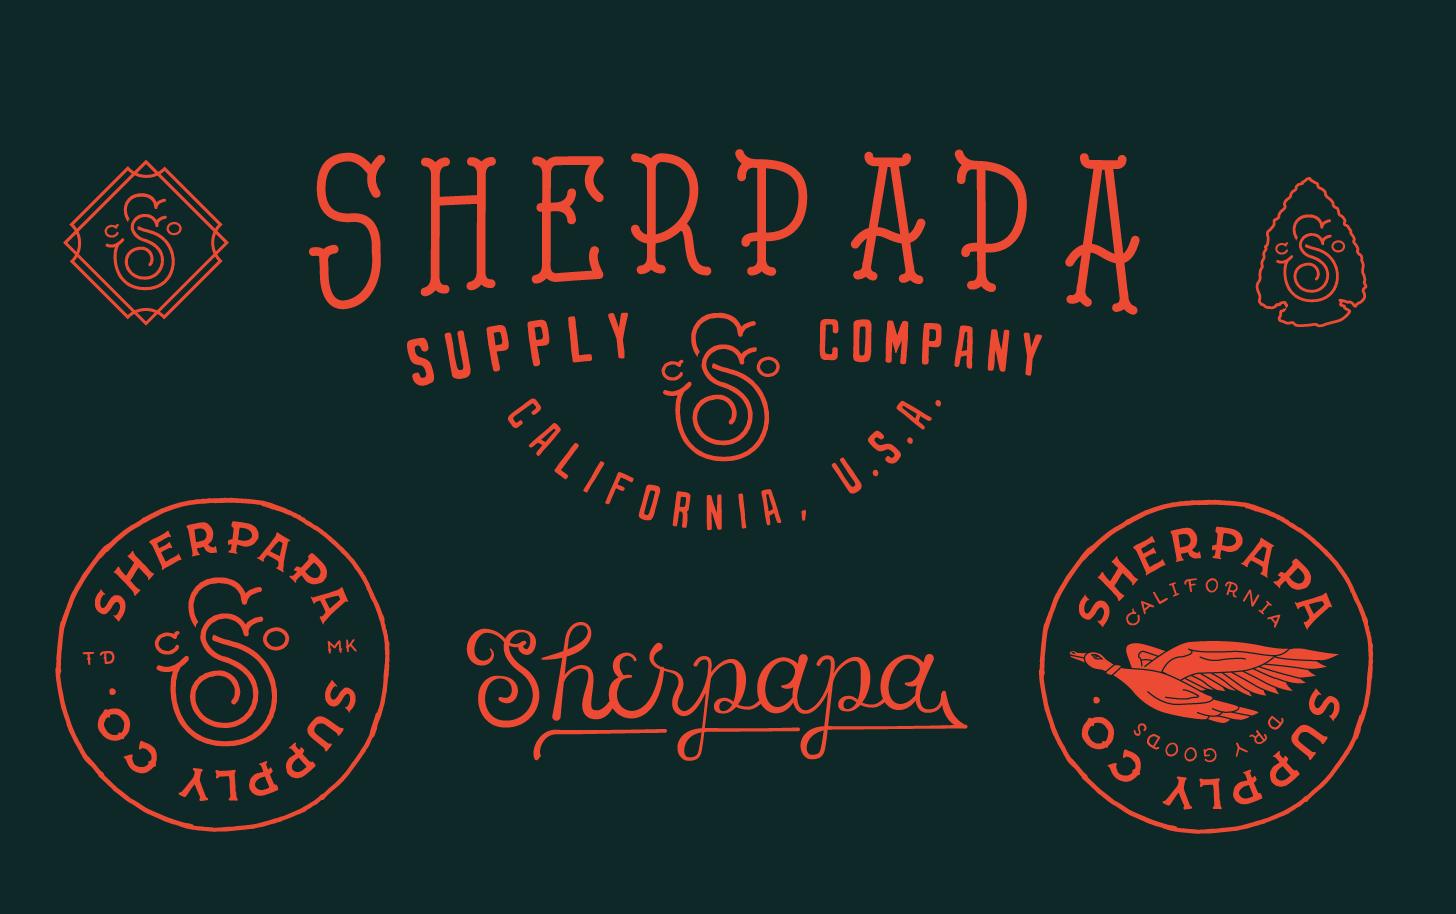 2017 sherp.png